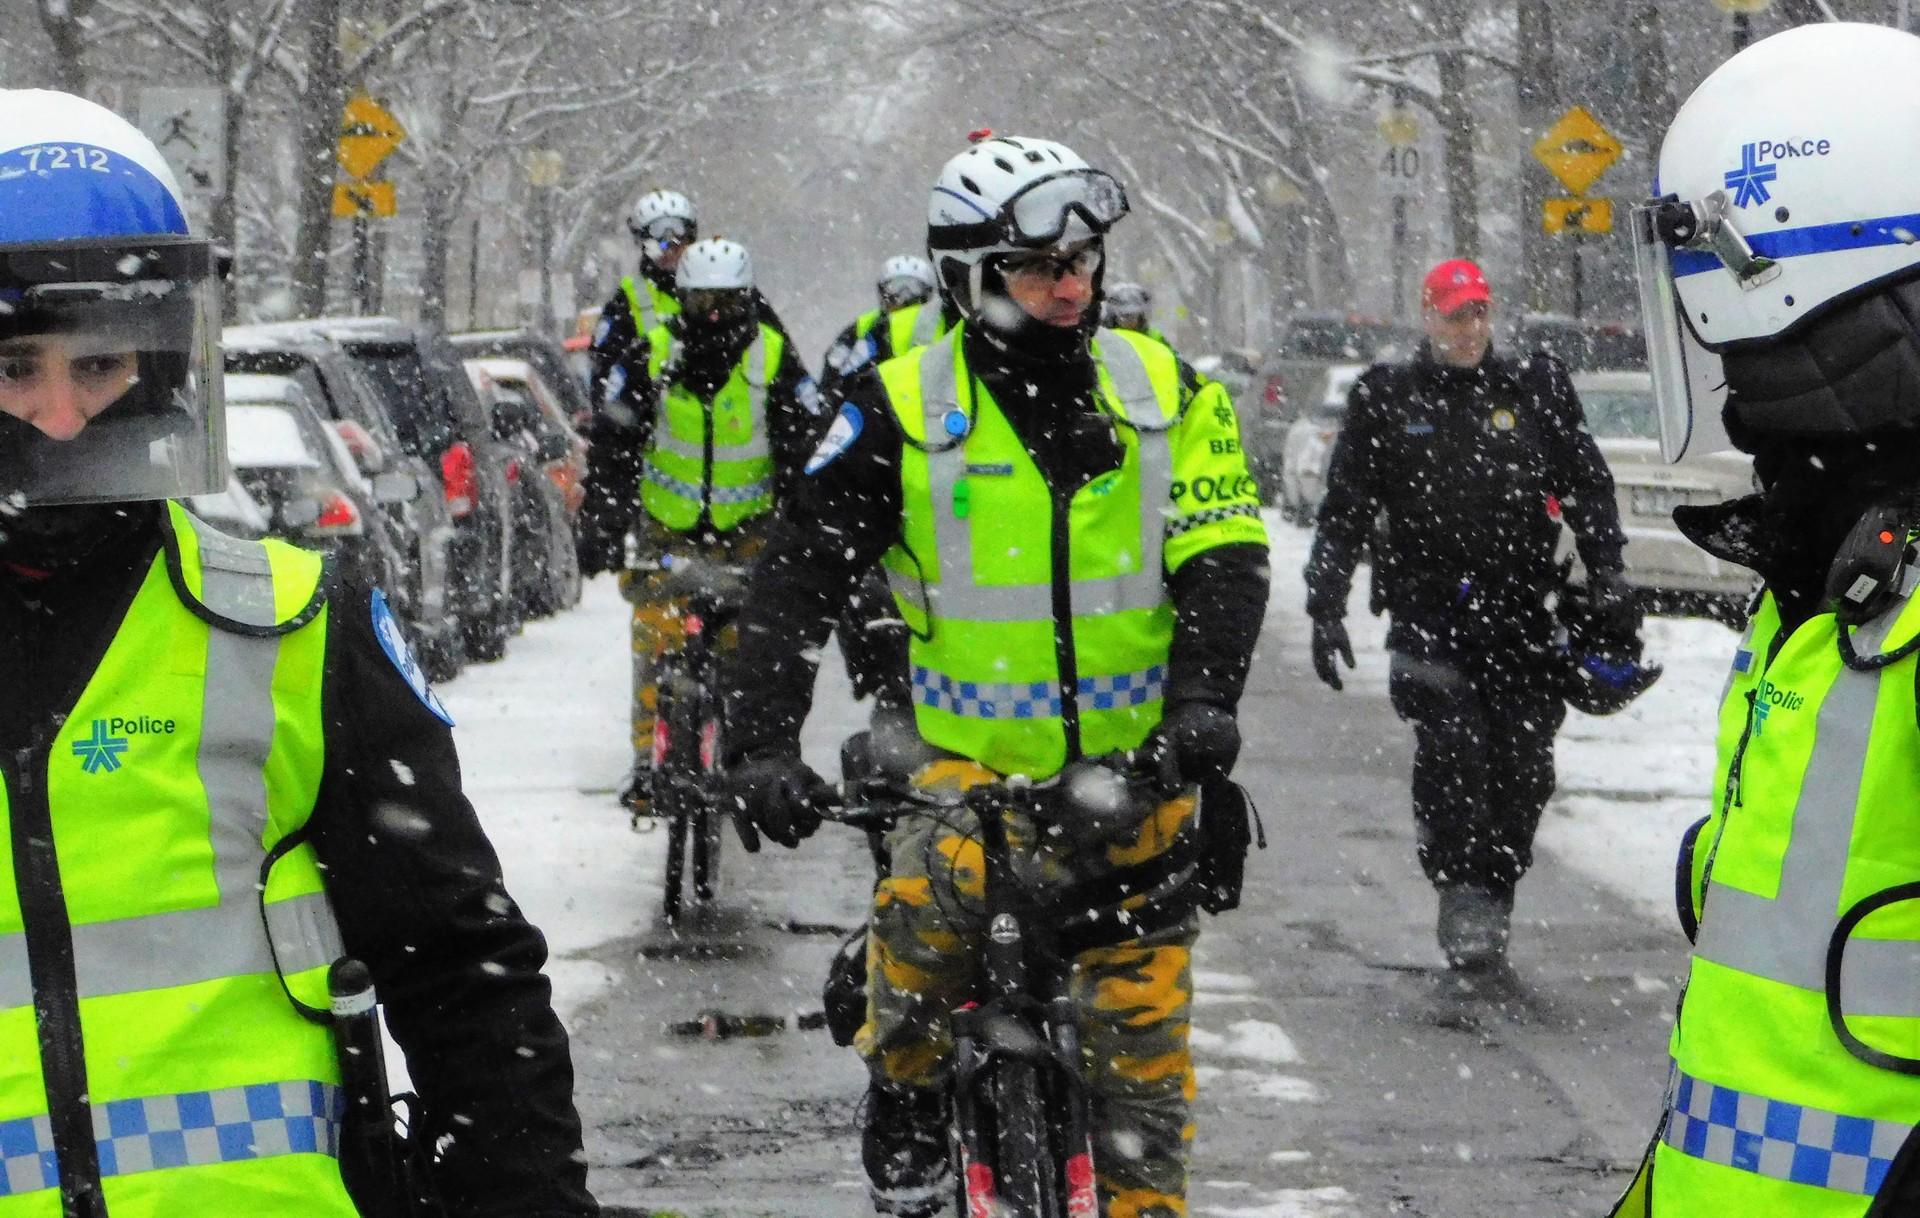 Montreal bicycle police | rick.cognyl.fournier, action, helmet, people